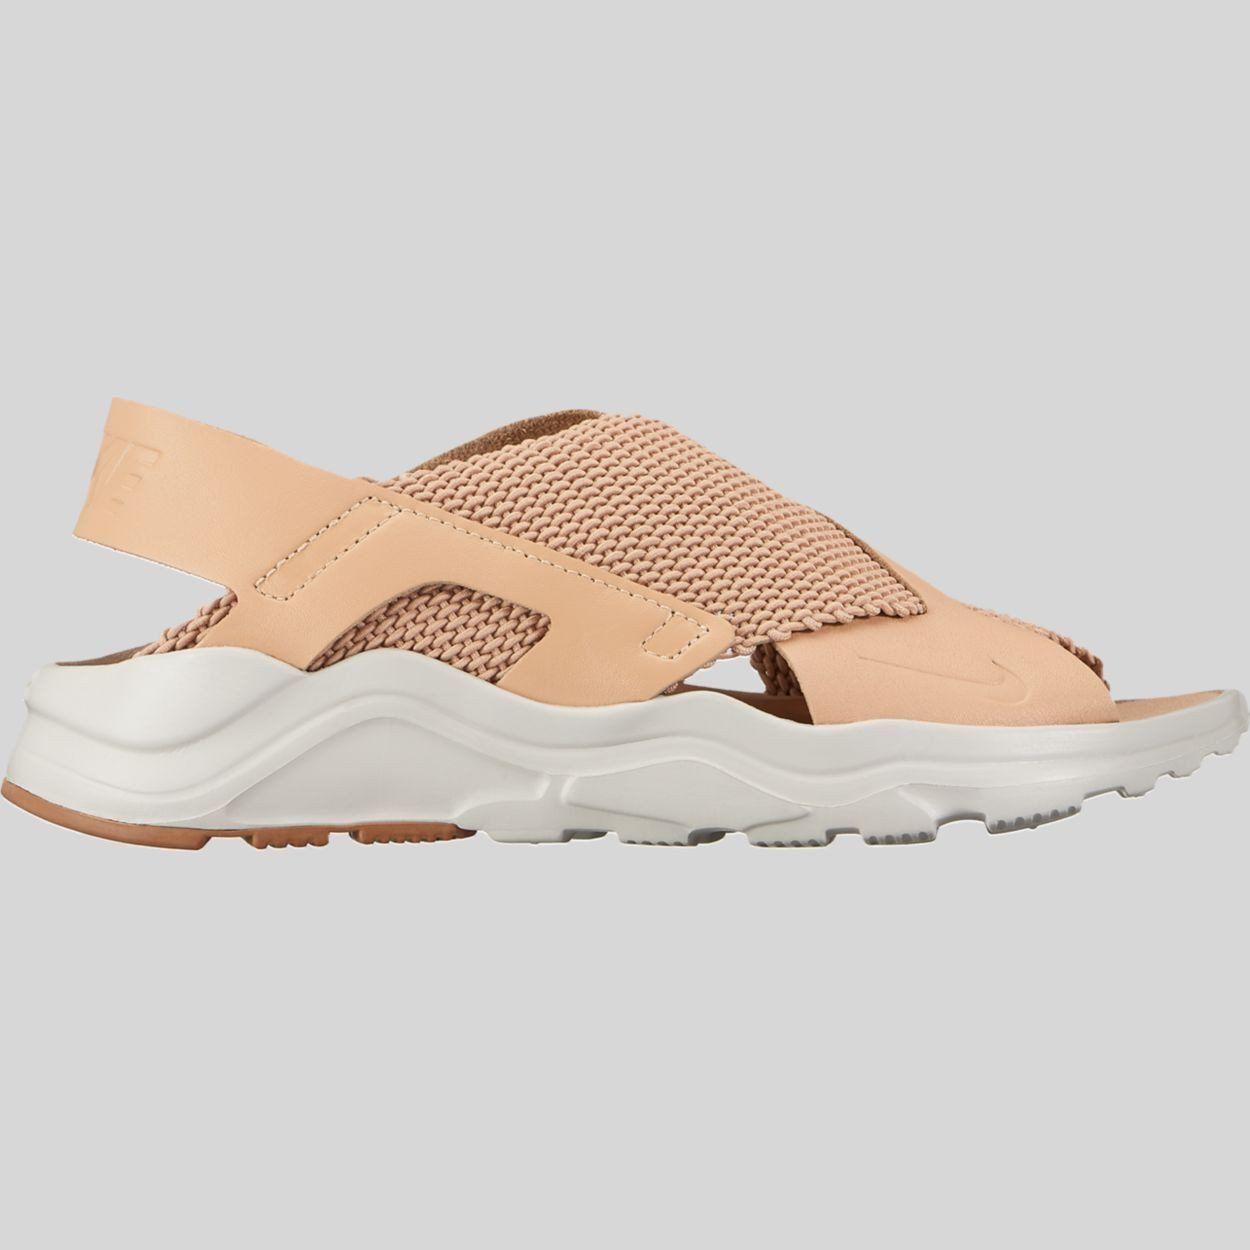 Nike air huarache ultra - tan 885118 200 wmn sz scarpa sinistra 7, scarpe di pelle)